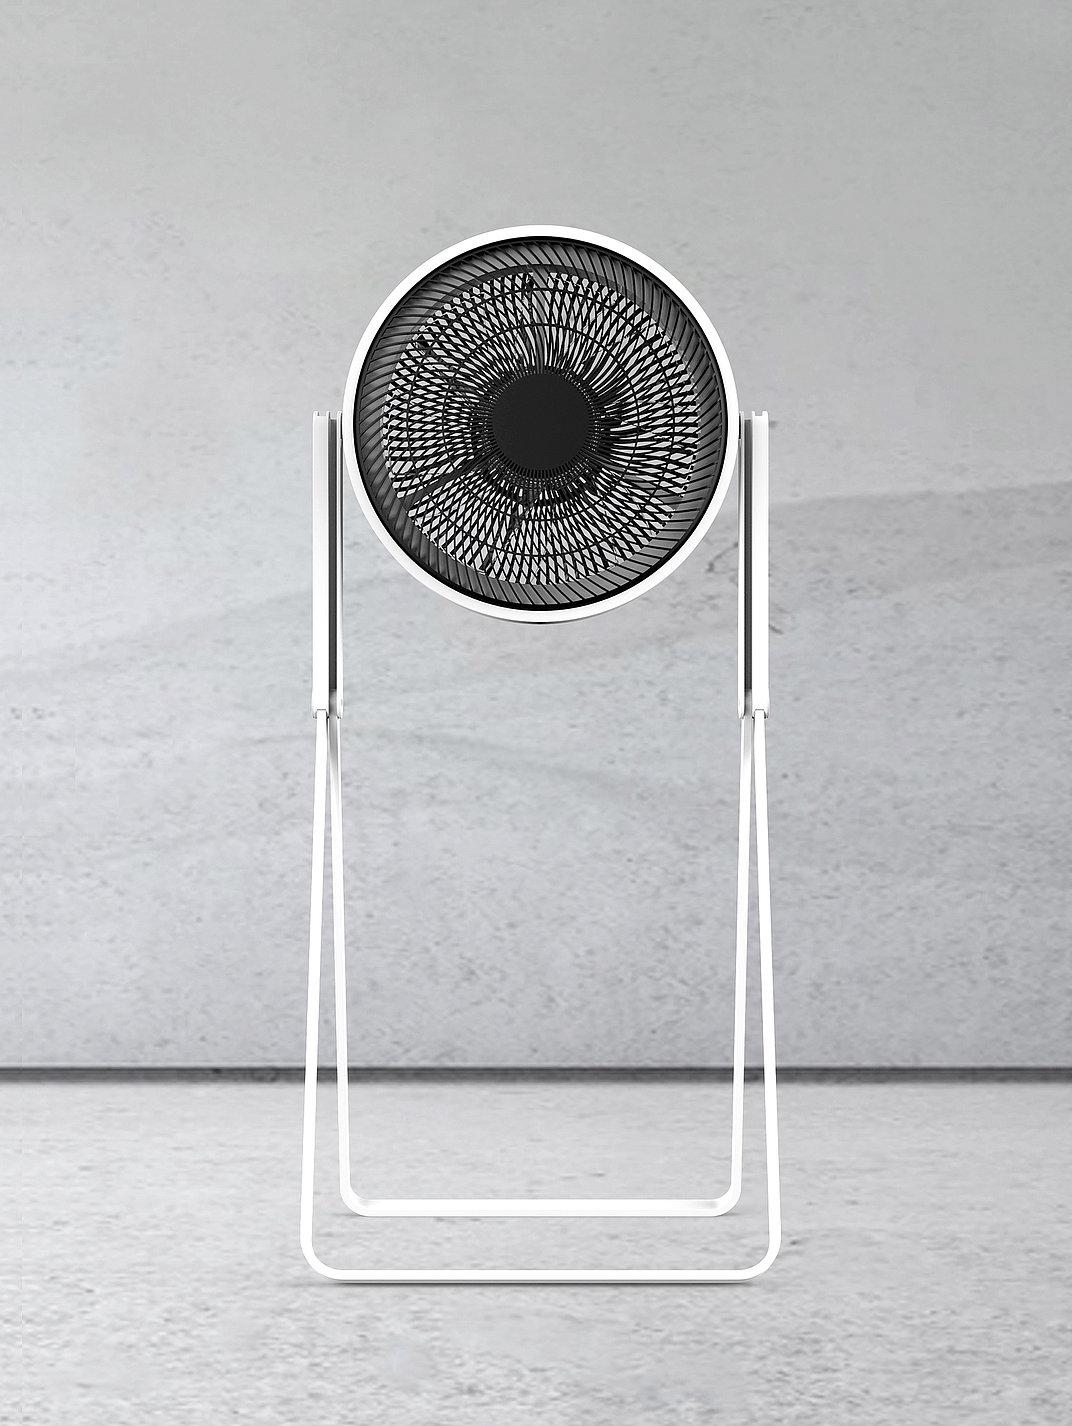 Easyshare Box Fan | Red Dot Design Award